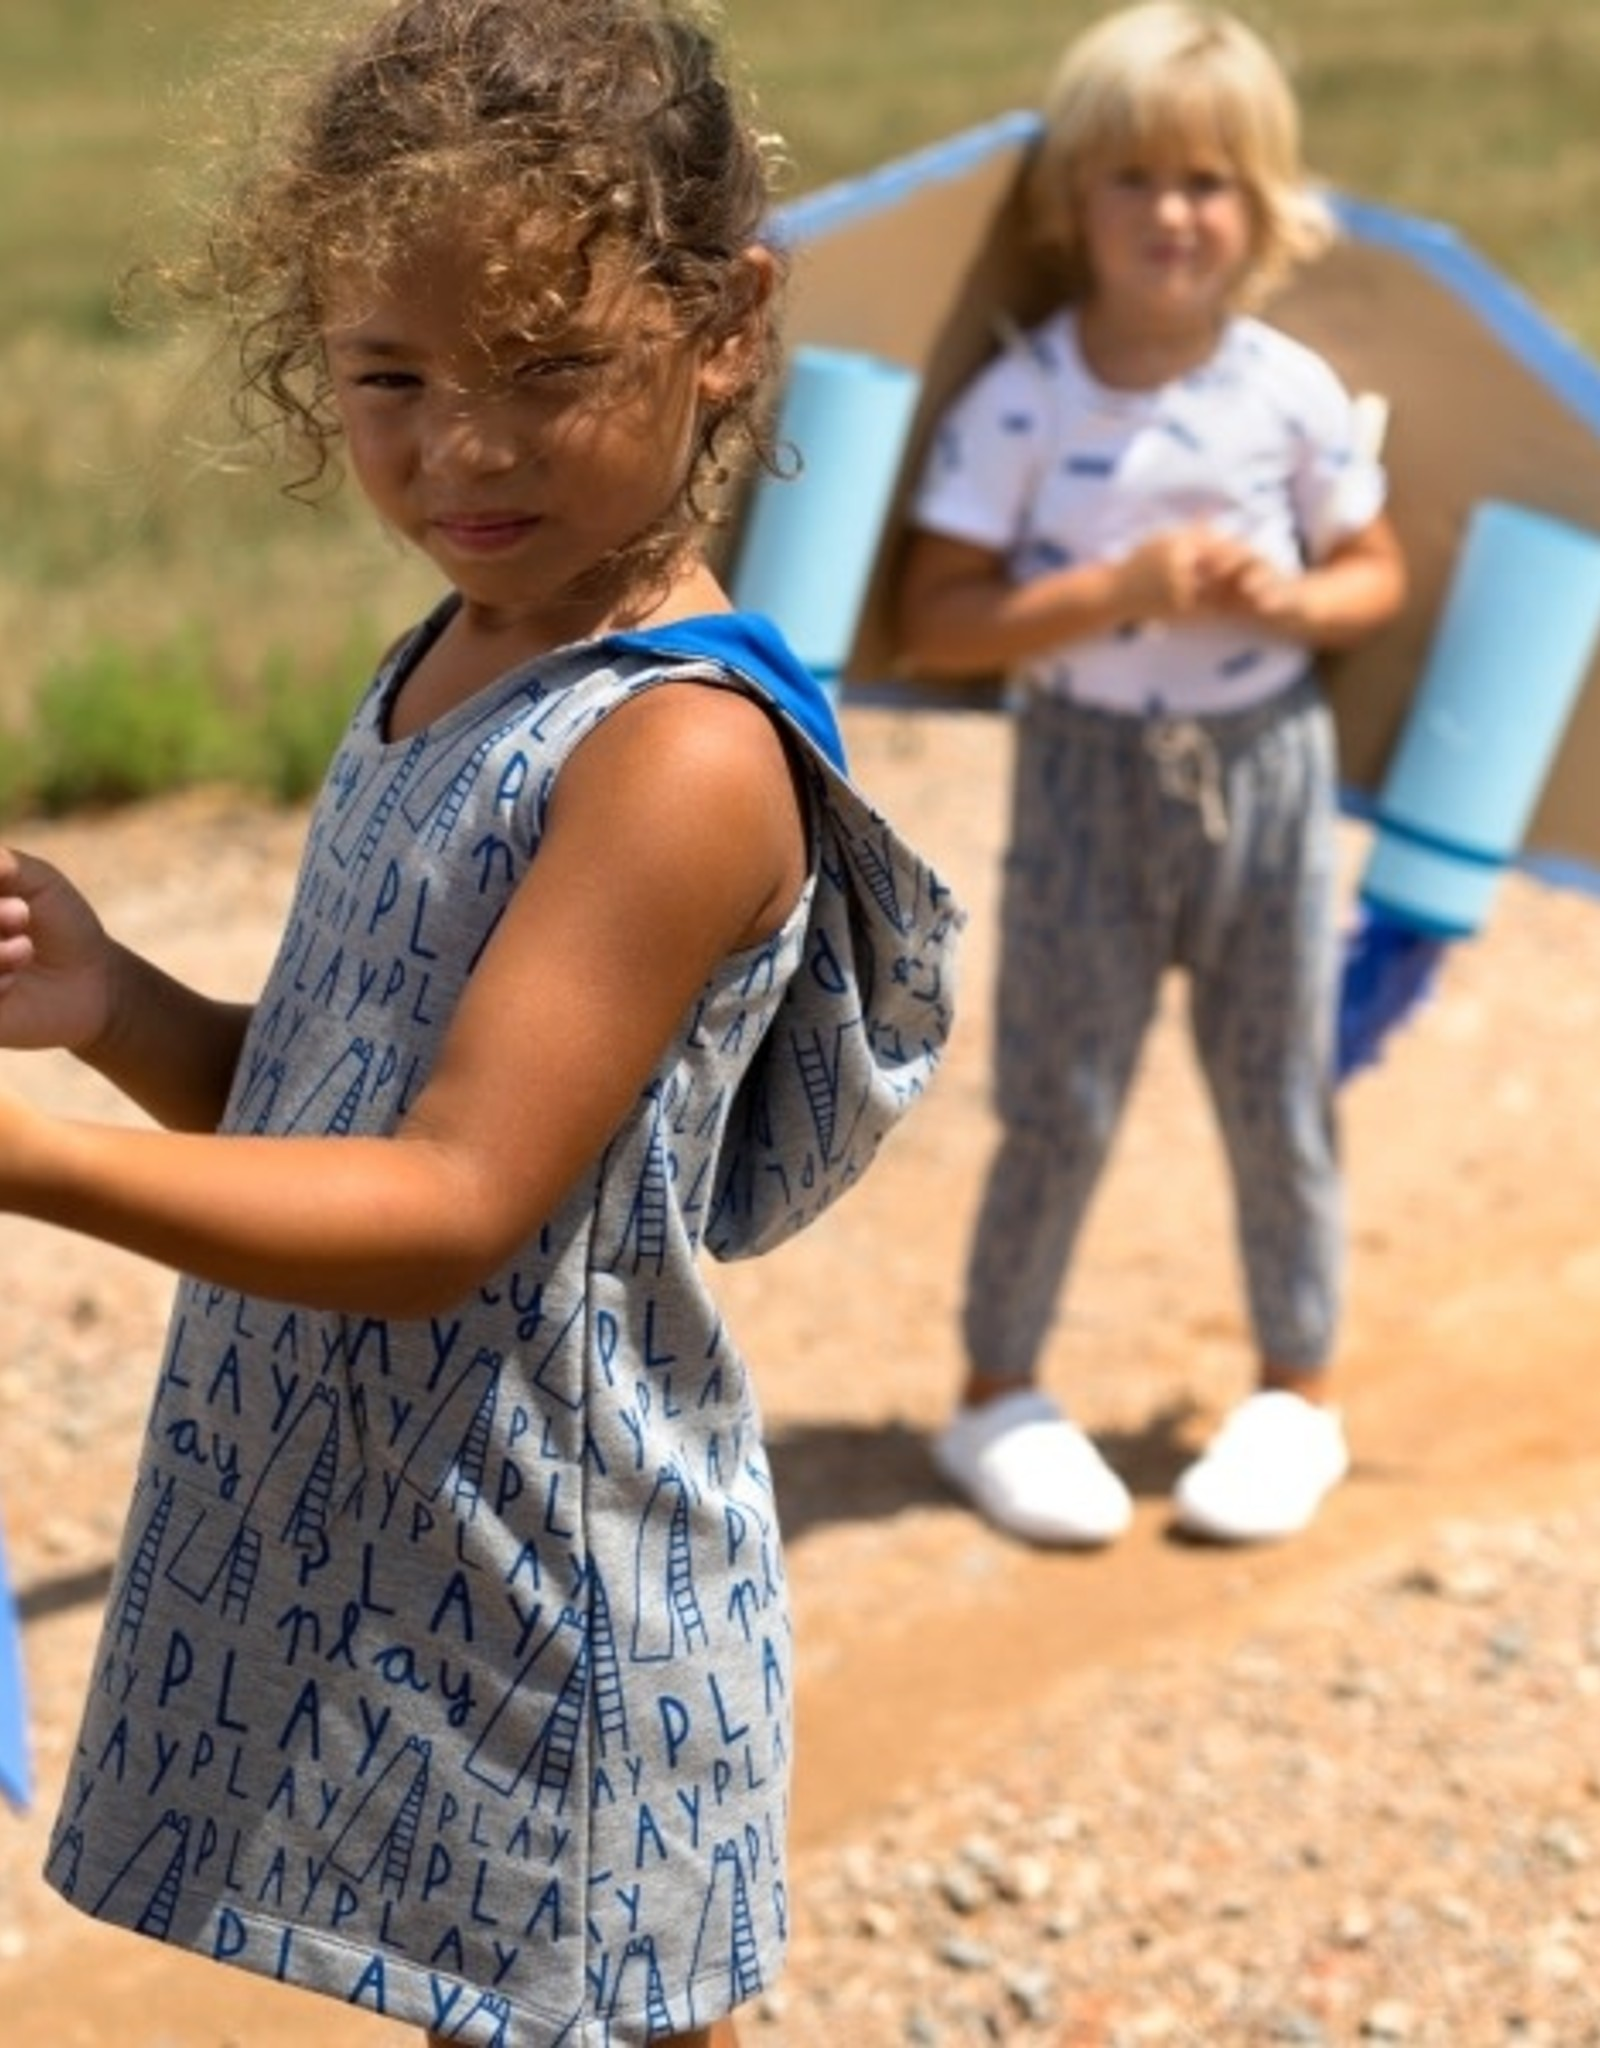 Katia Katia Fabrics Summer Sweat Melange Don't Forget to Play SS4